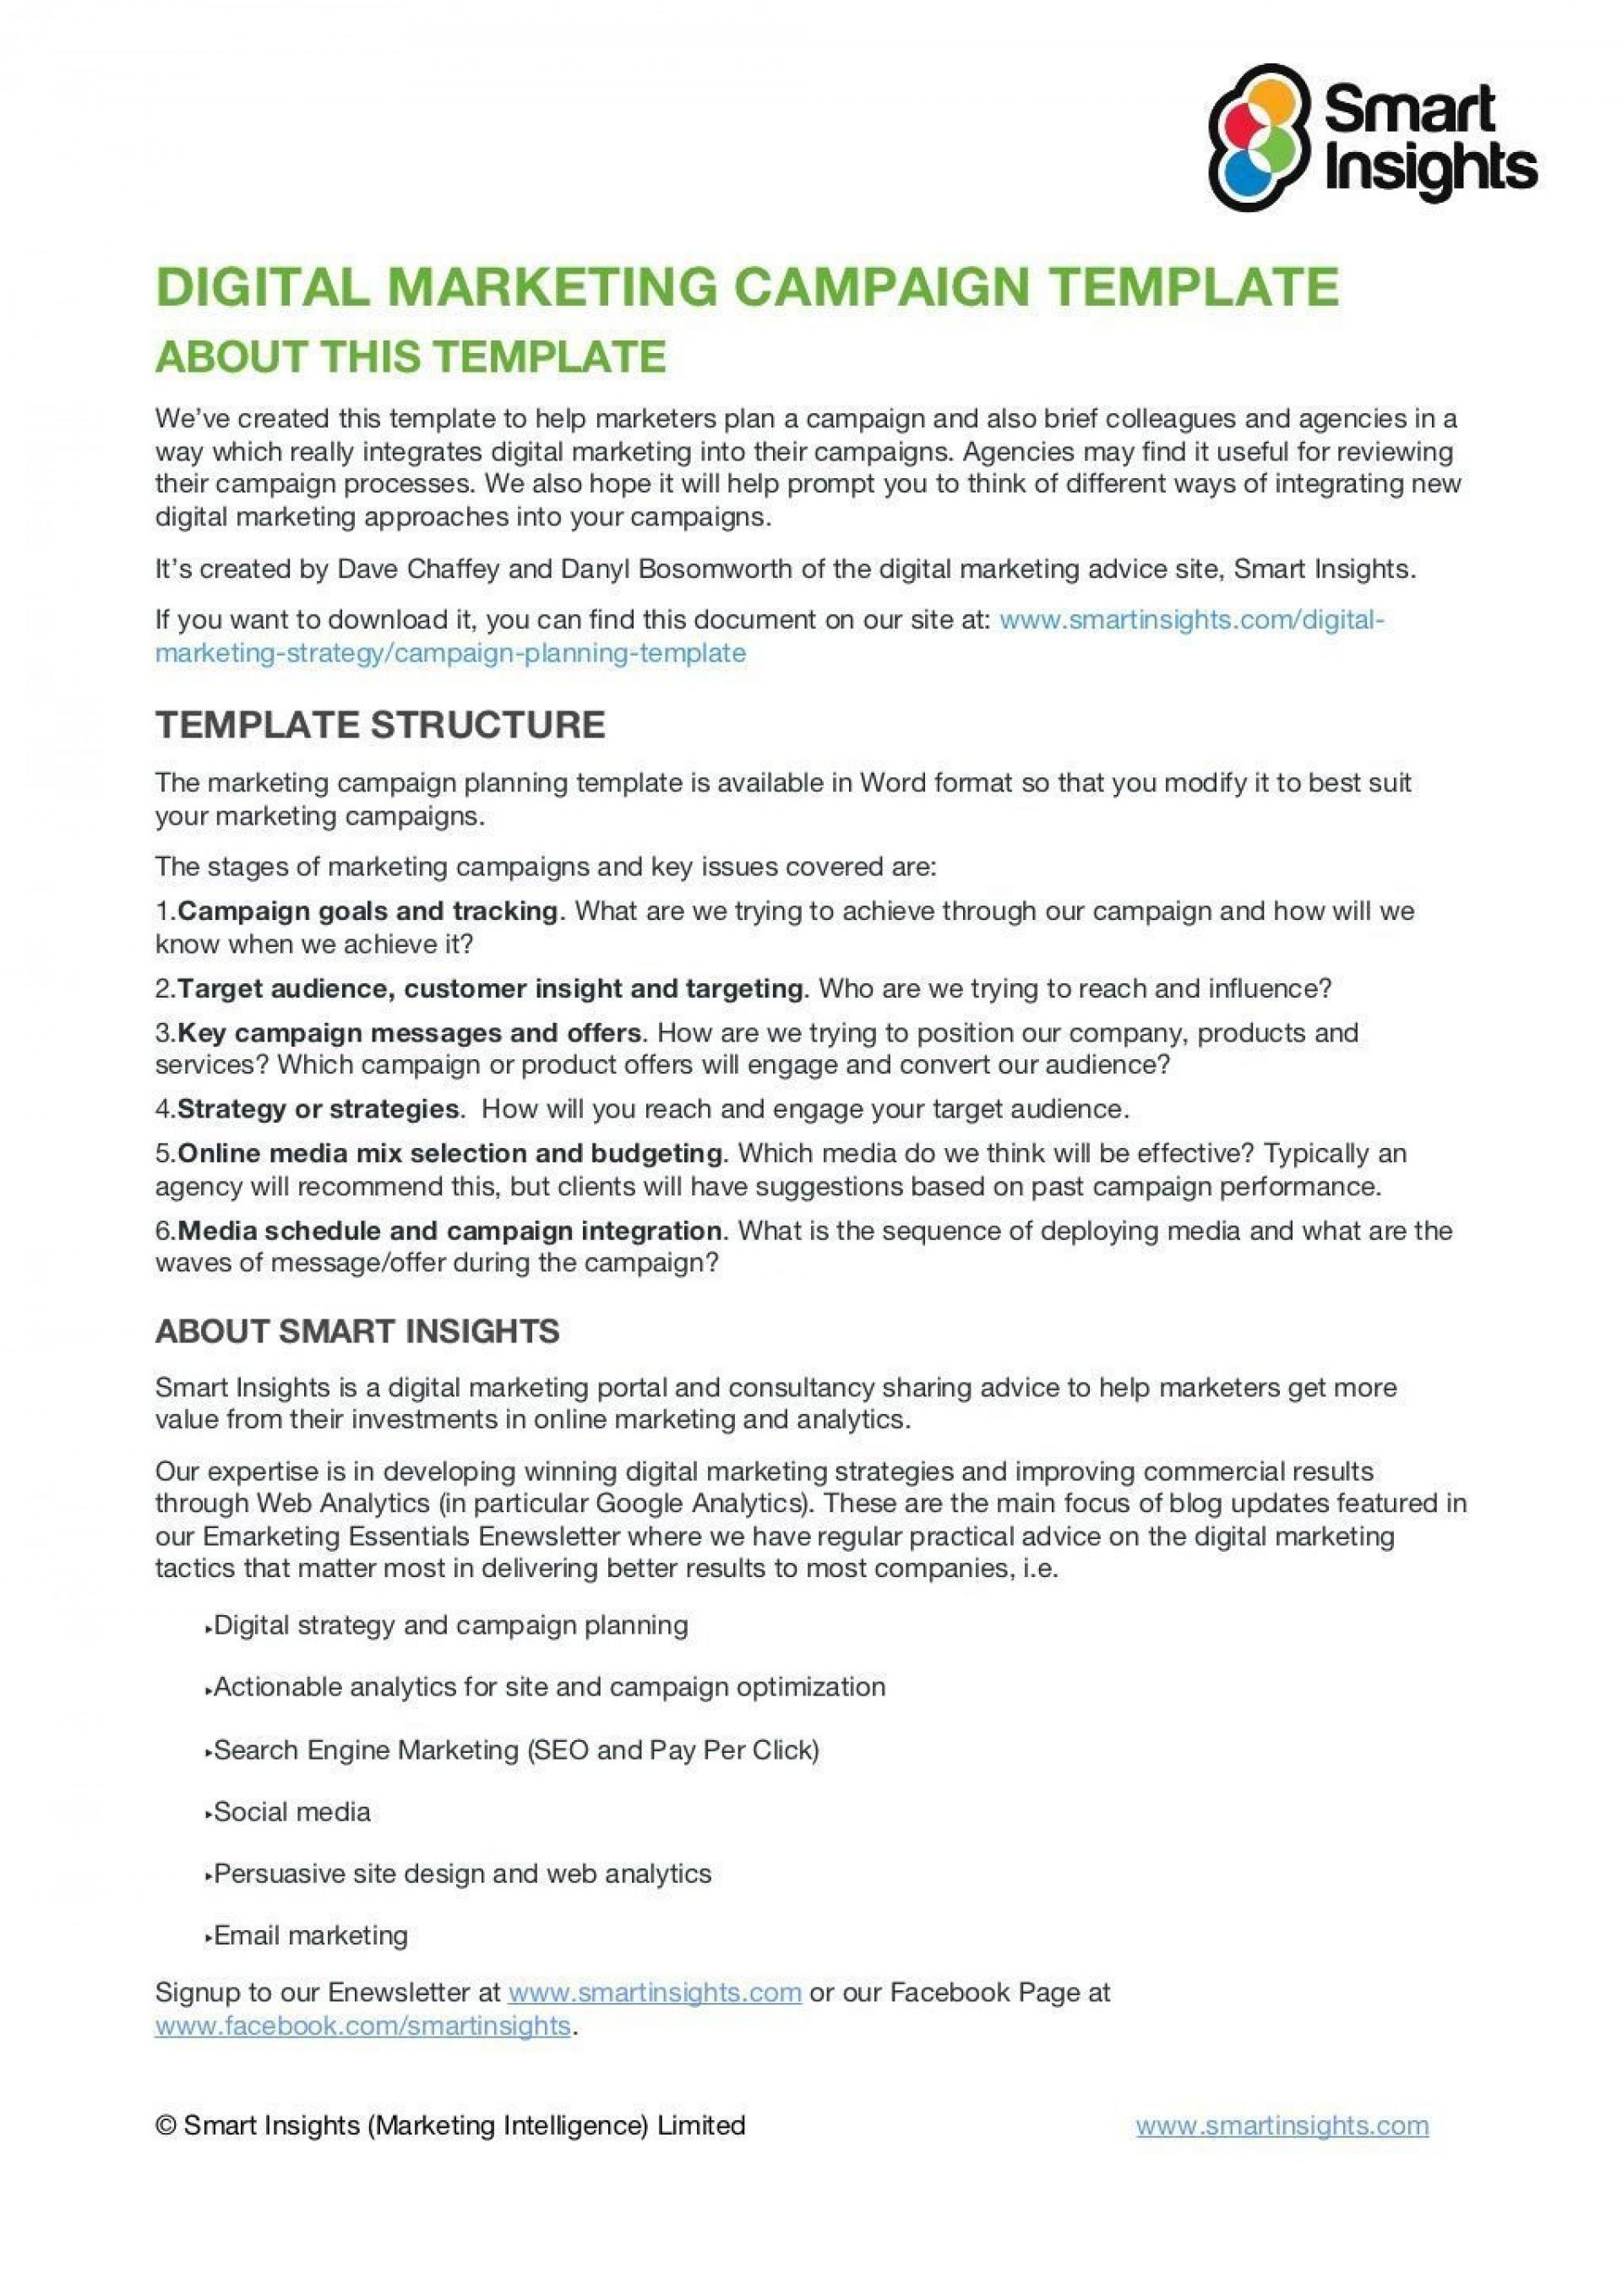 003 Stupendou Digital Marketing Campaign Plan Example Concept  Template1920